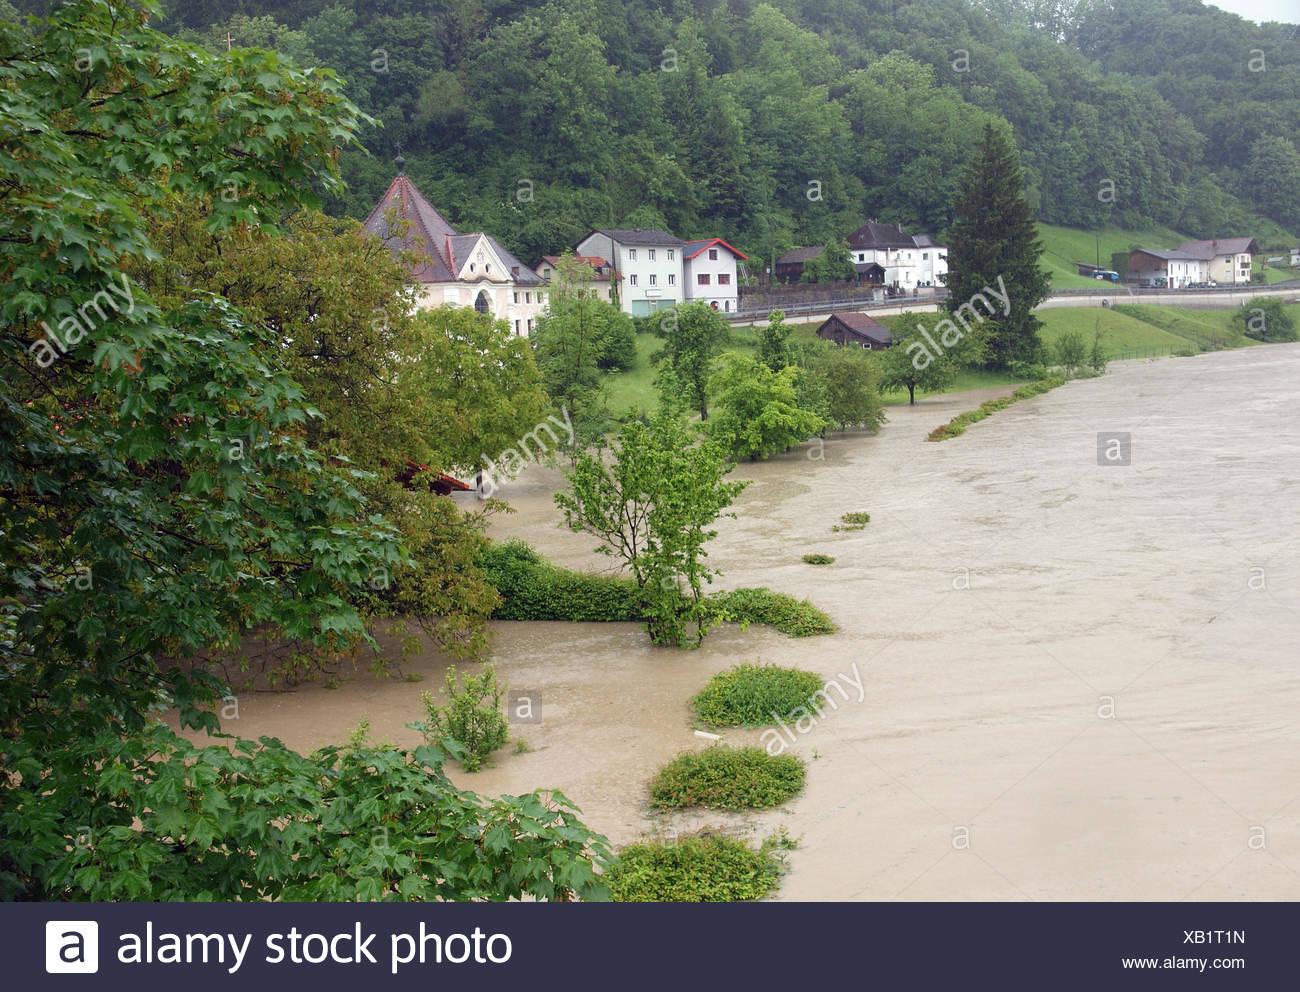 flood, natural disaster, water, flood, catastrophe, natural disaster, - Stock Image